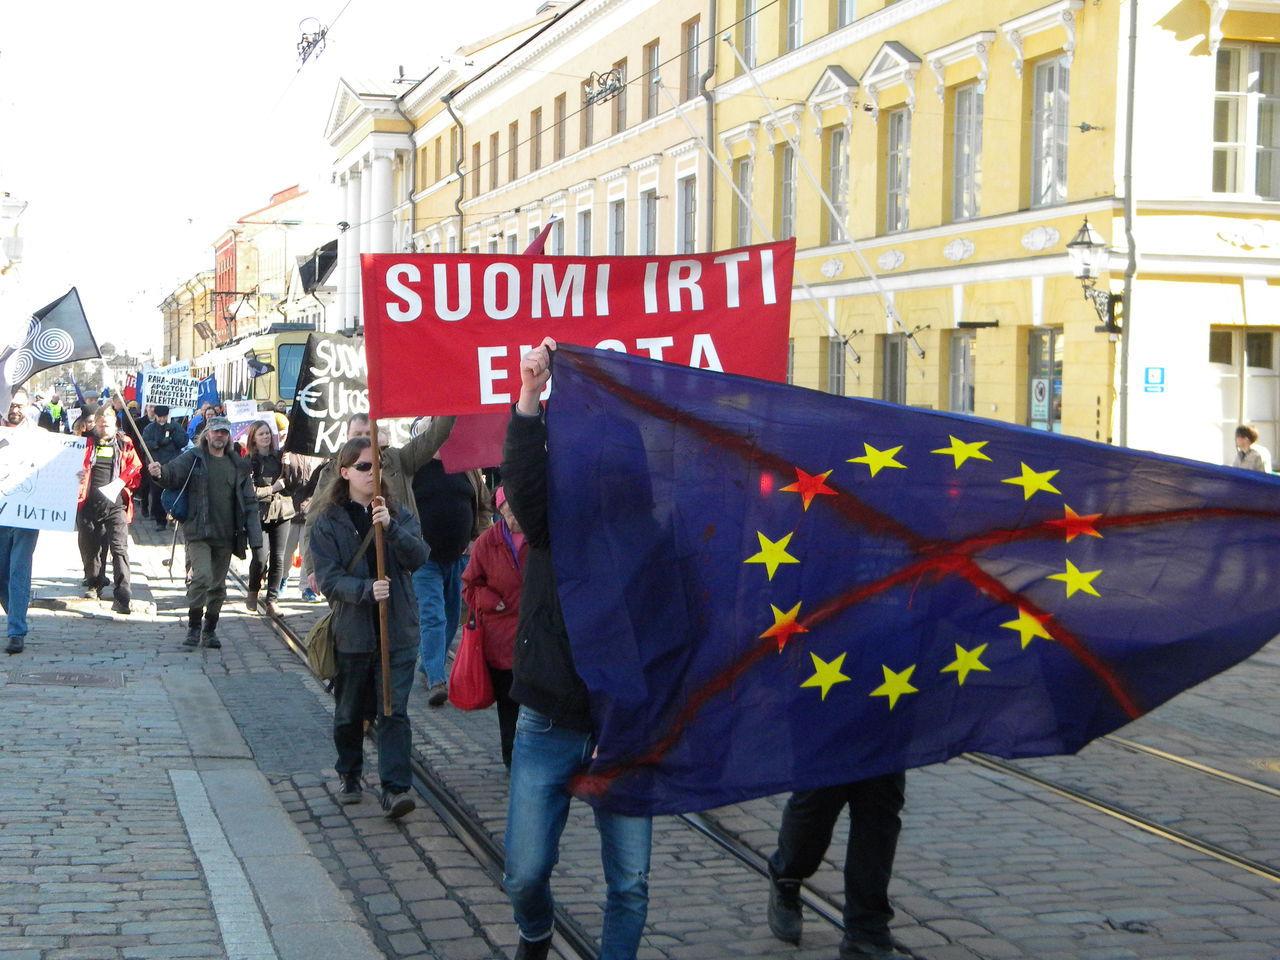 UK_EU-mielenosoitus_4